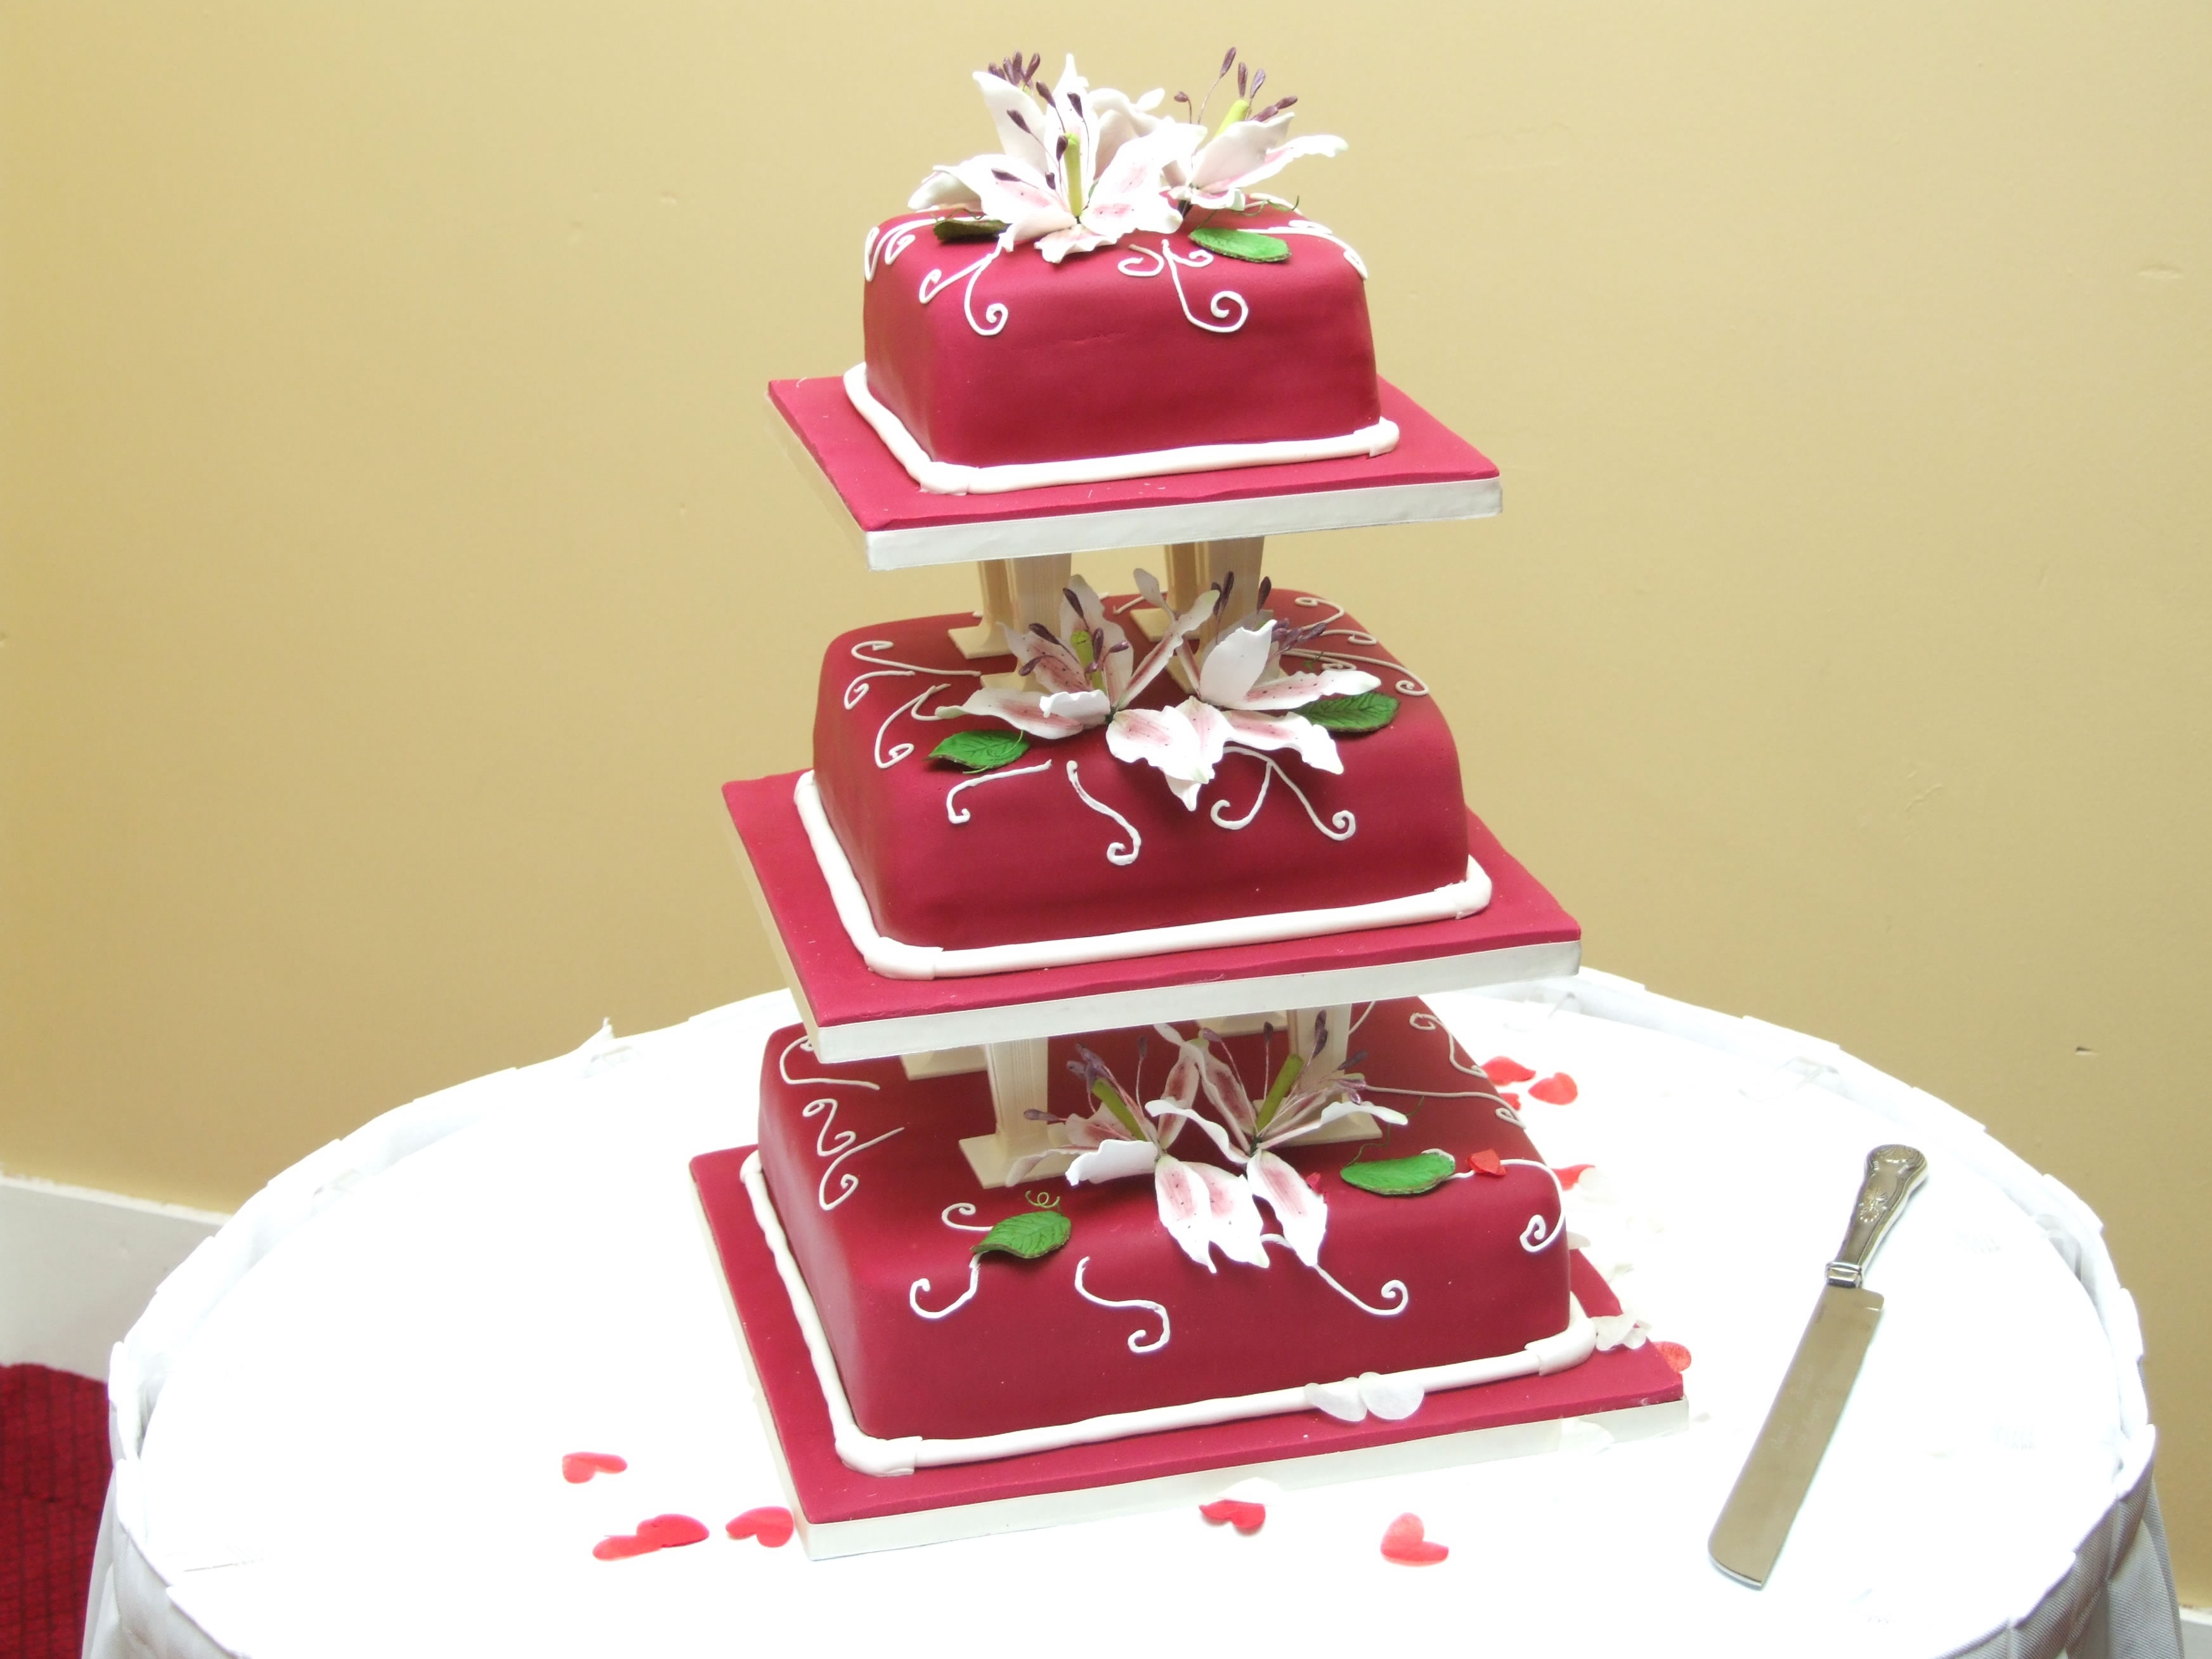 Cakes Photoshop Contest (15200), Pictures Page 1 - Pxleyes.com